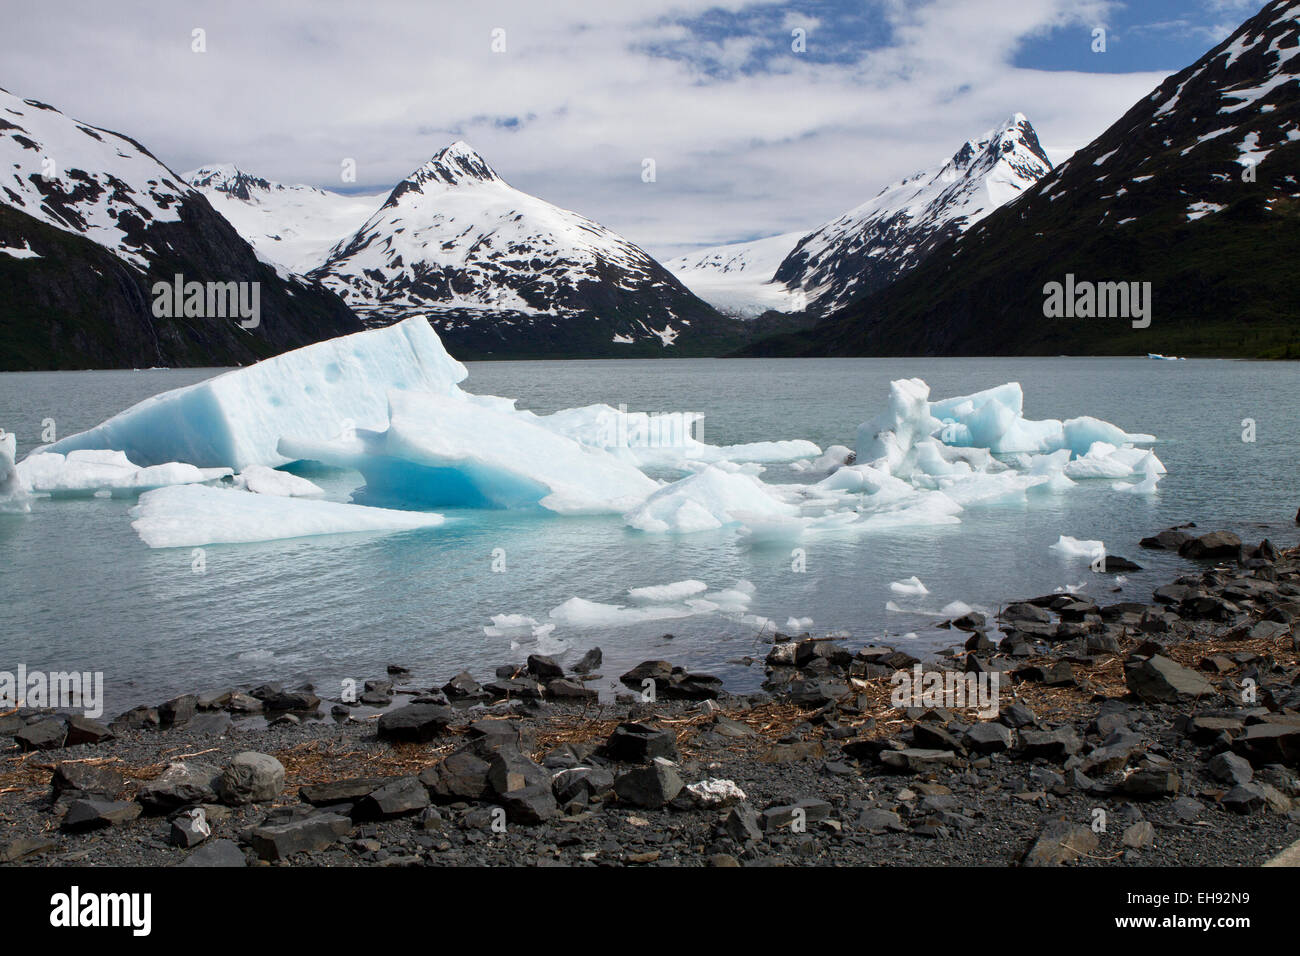 Icebergs in Portage Lake, Alaska - Stock Image